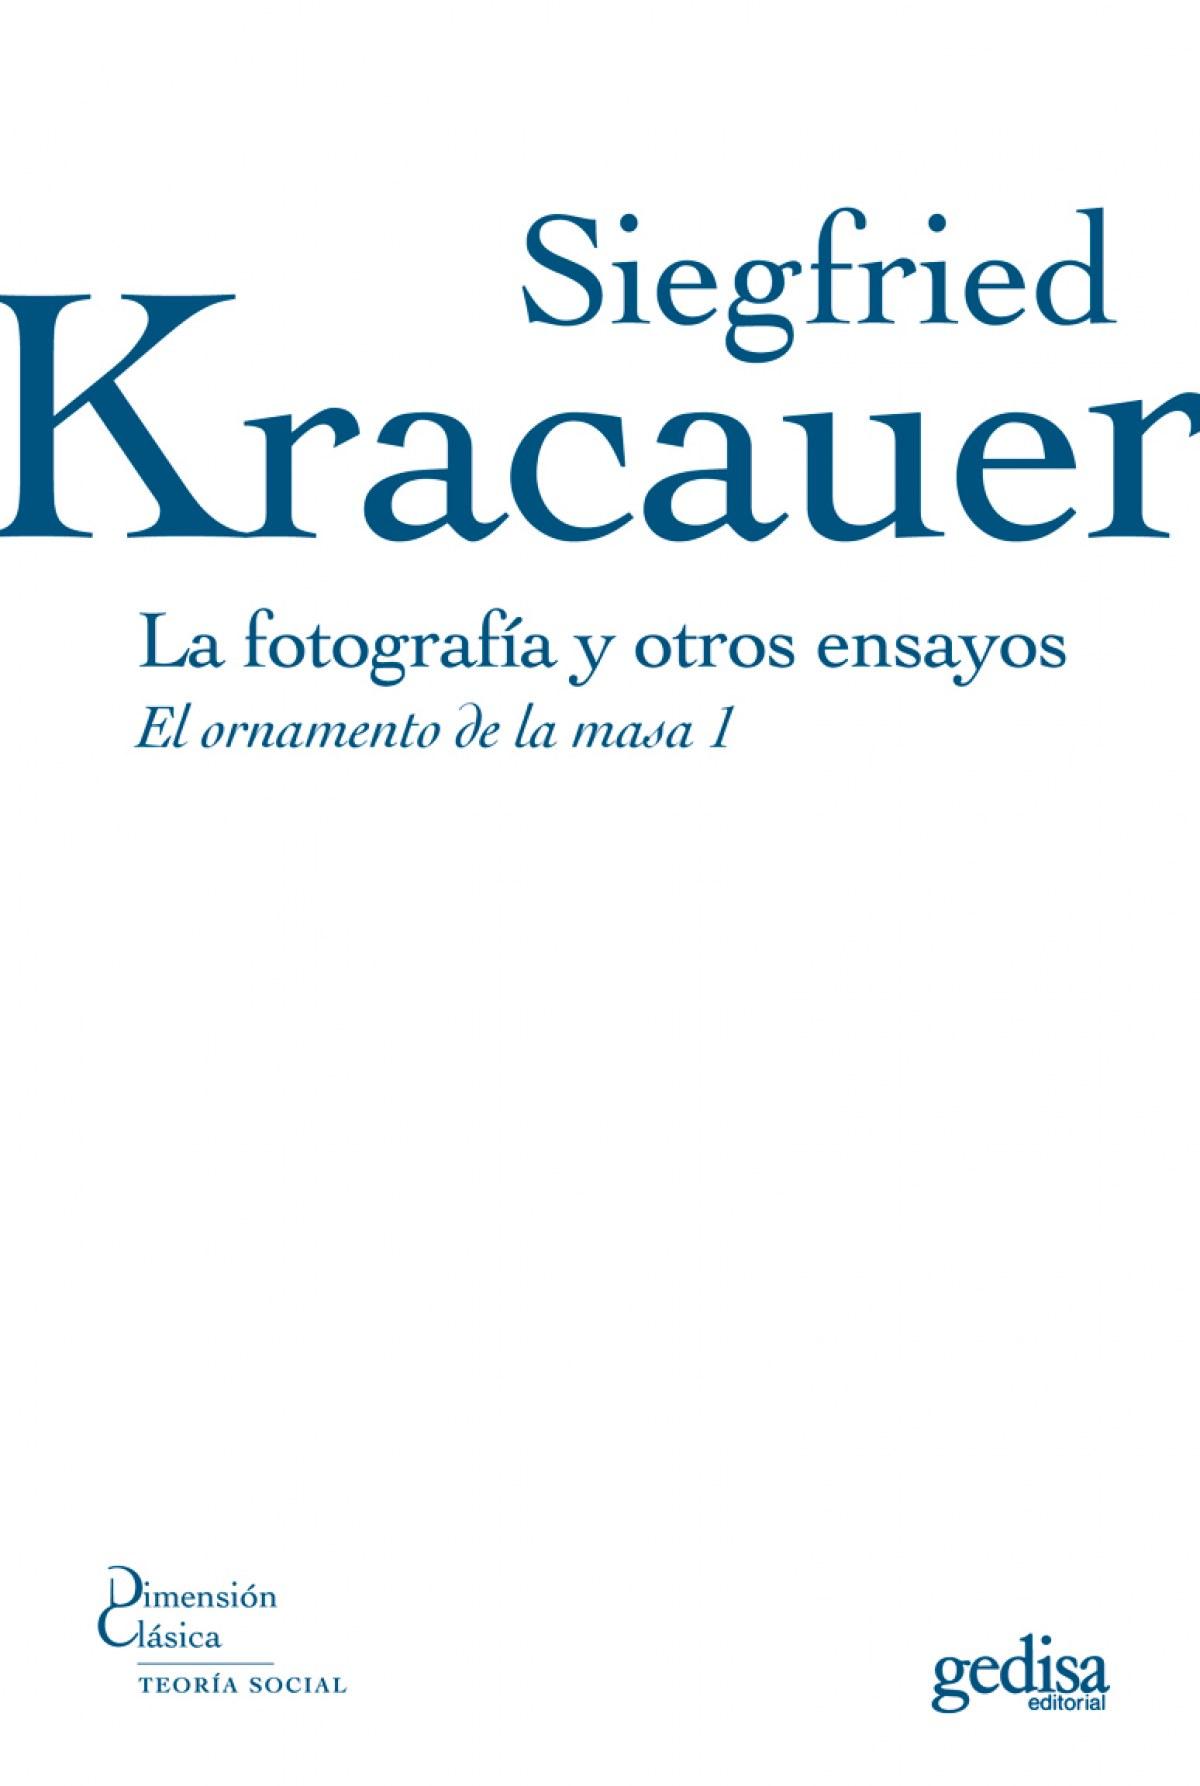 Fotografia Y Otros Ensayos, La - Kracauer, Siegfried